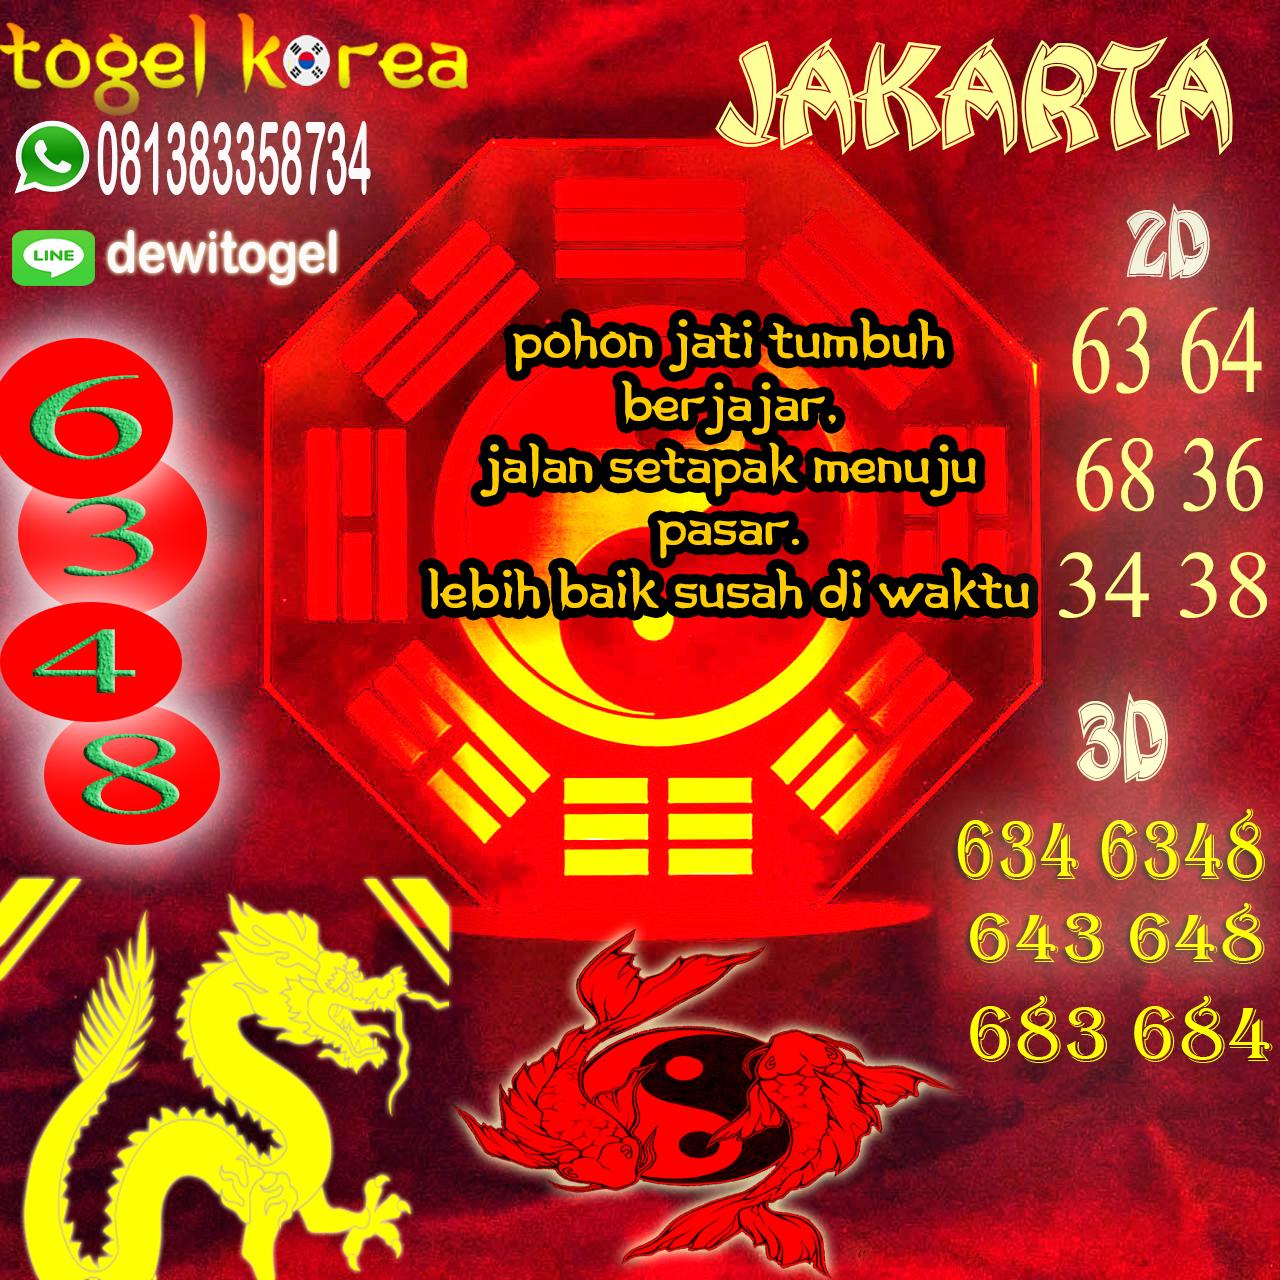 PREDIKSI JITU JAKARTA (JKT) 09 AGUSTUS 2020